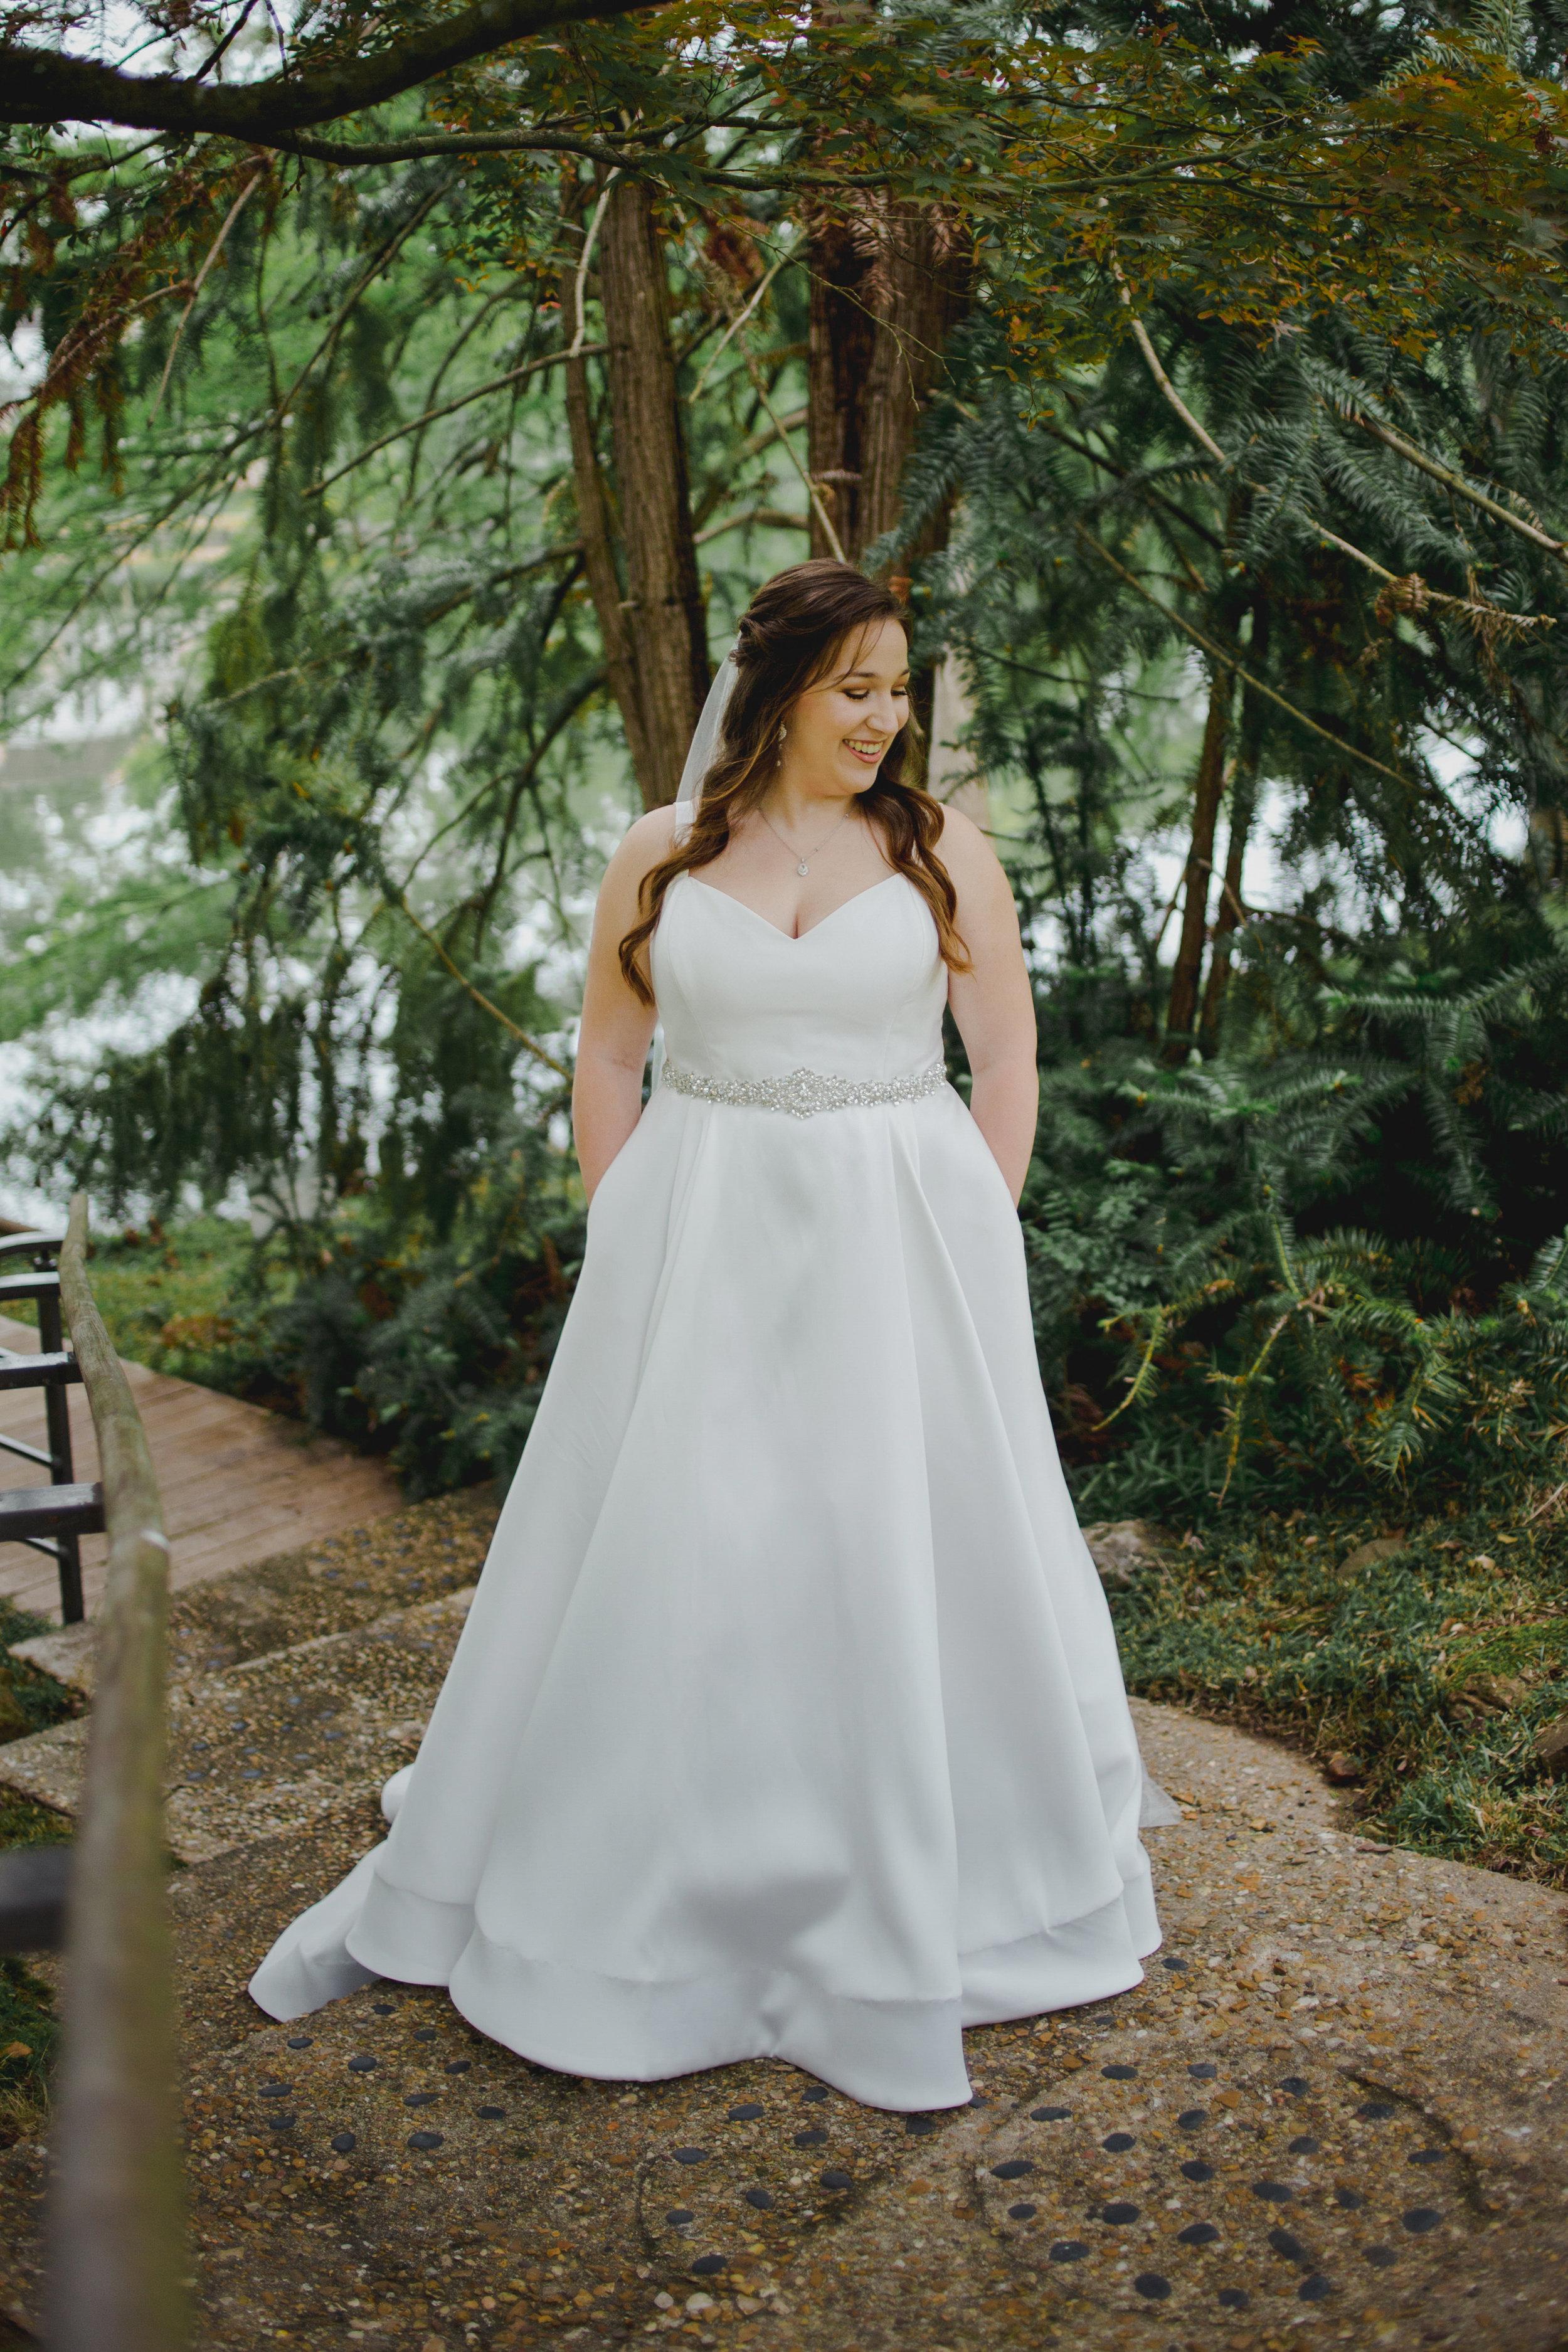 monroe-wedding-photographer-8.jpg